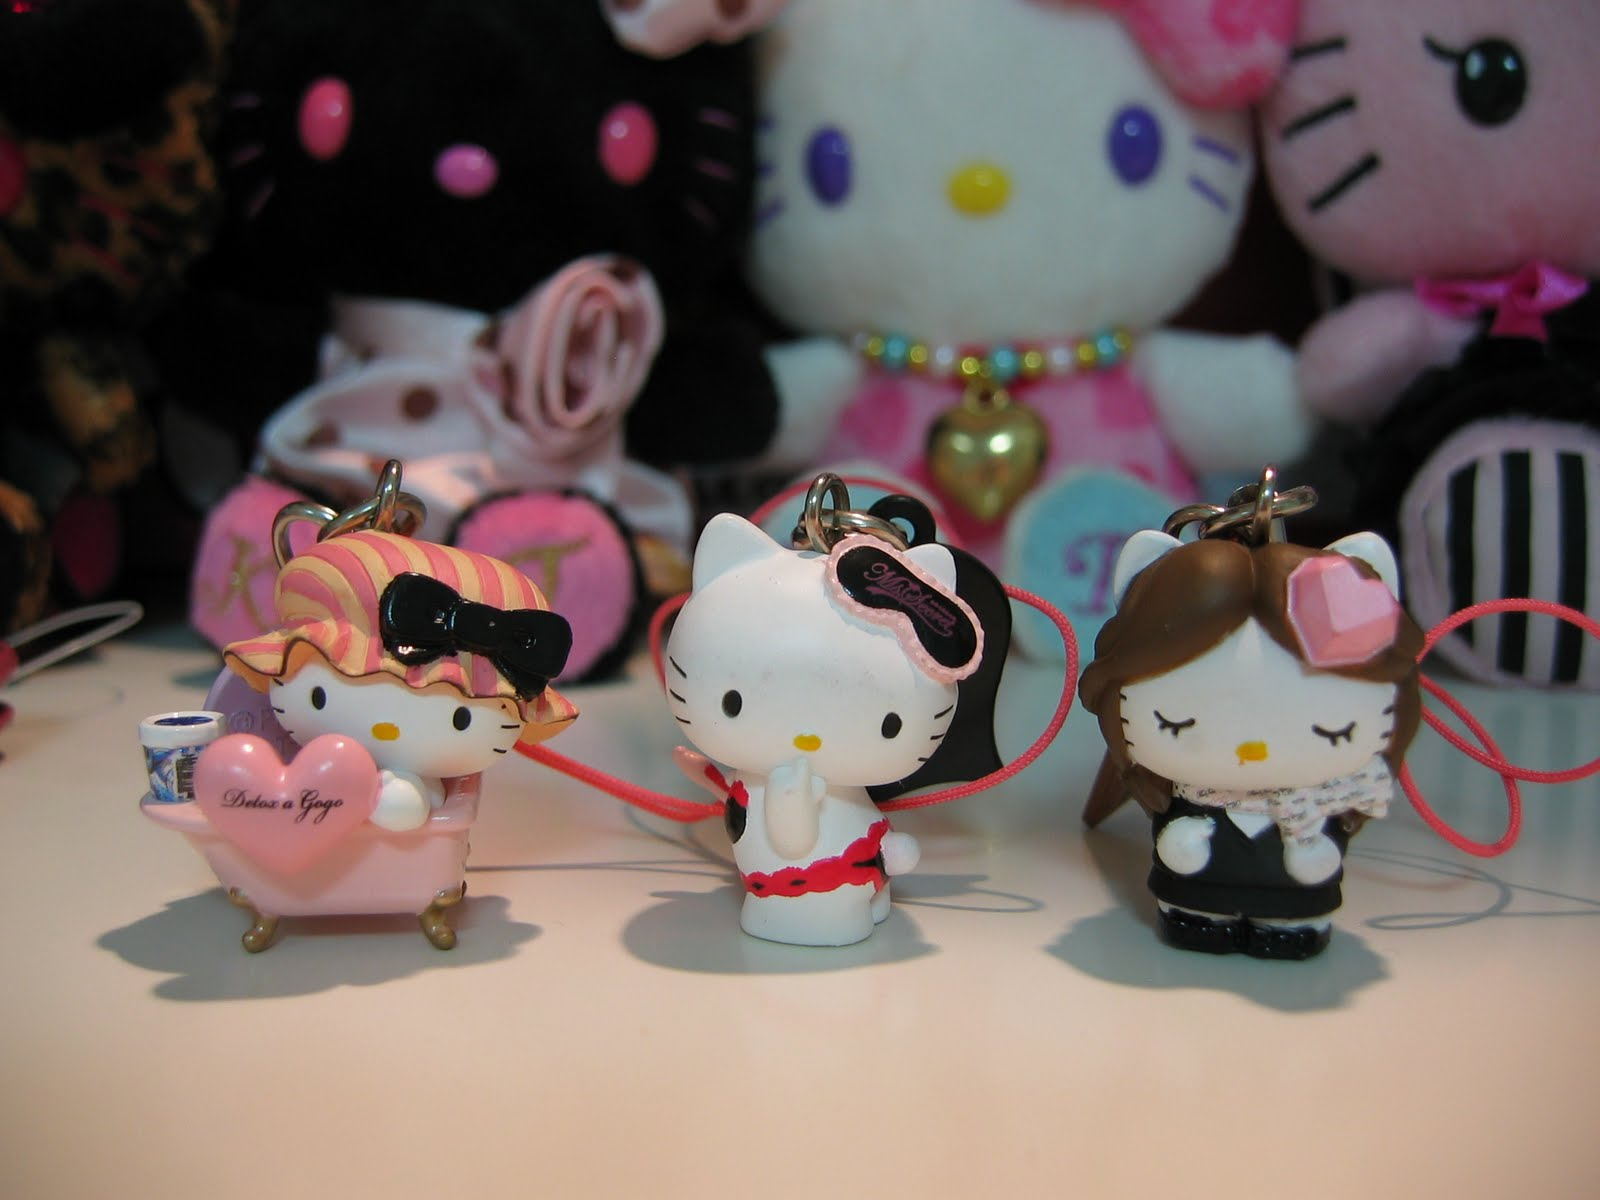 Download Wallpaper Hello Kitty Peach - hello+kitty+033  Trends_4350.jpg